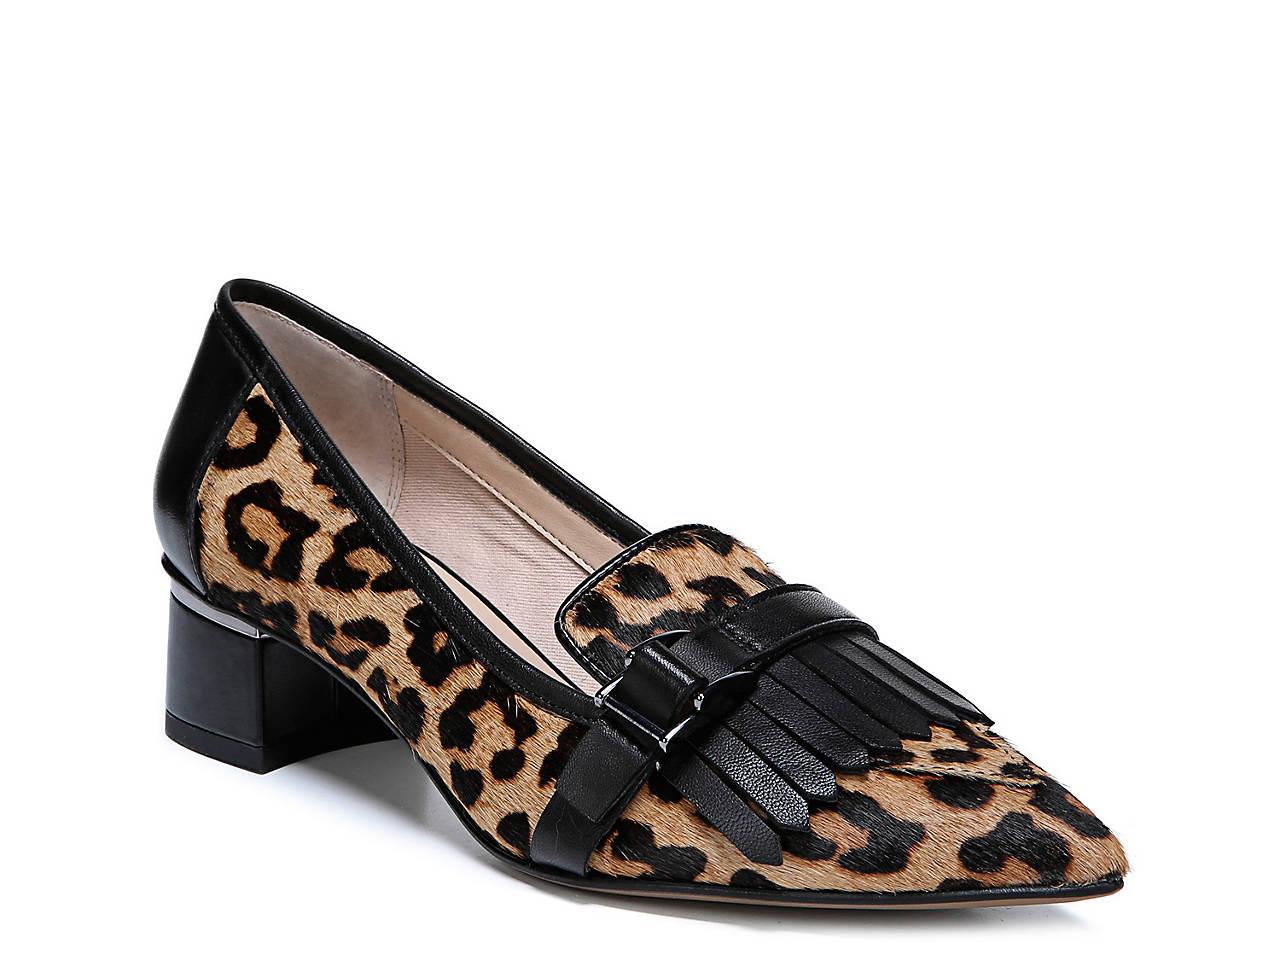 Franco Sarto Grenoble 2 Loafer Women s Shoes  bca0595a731c6